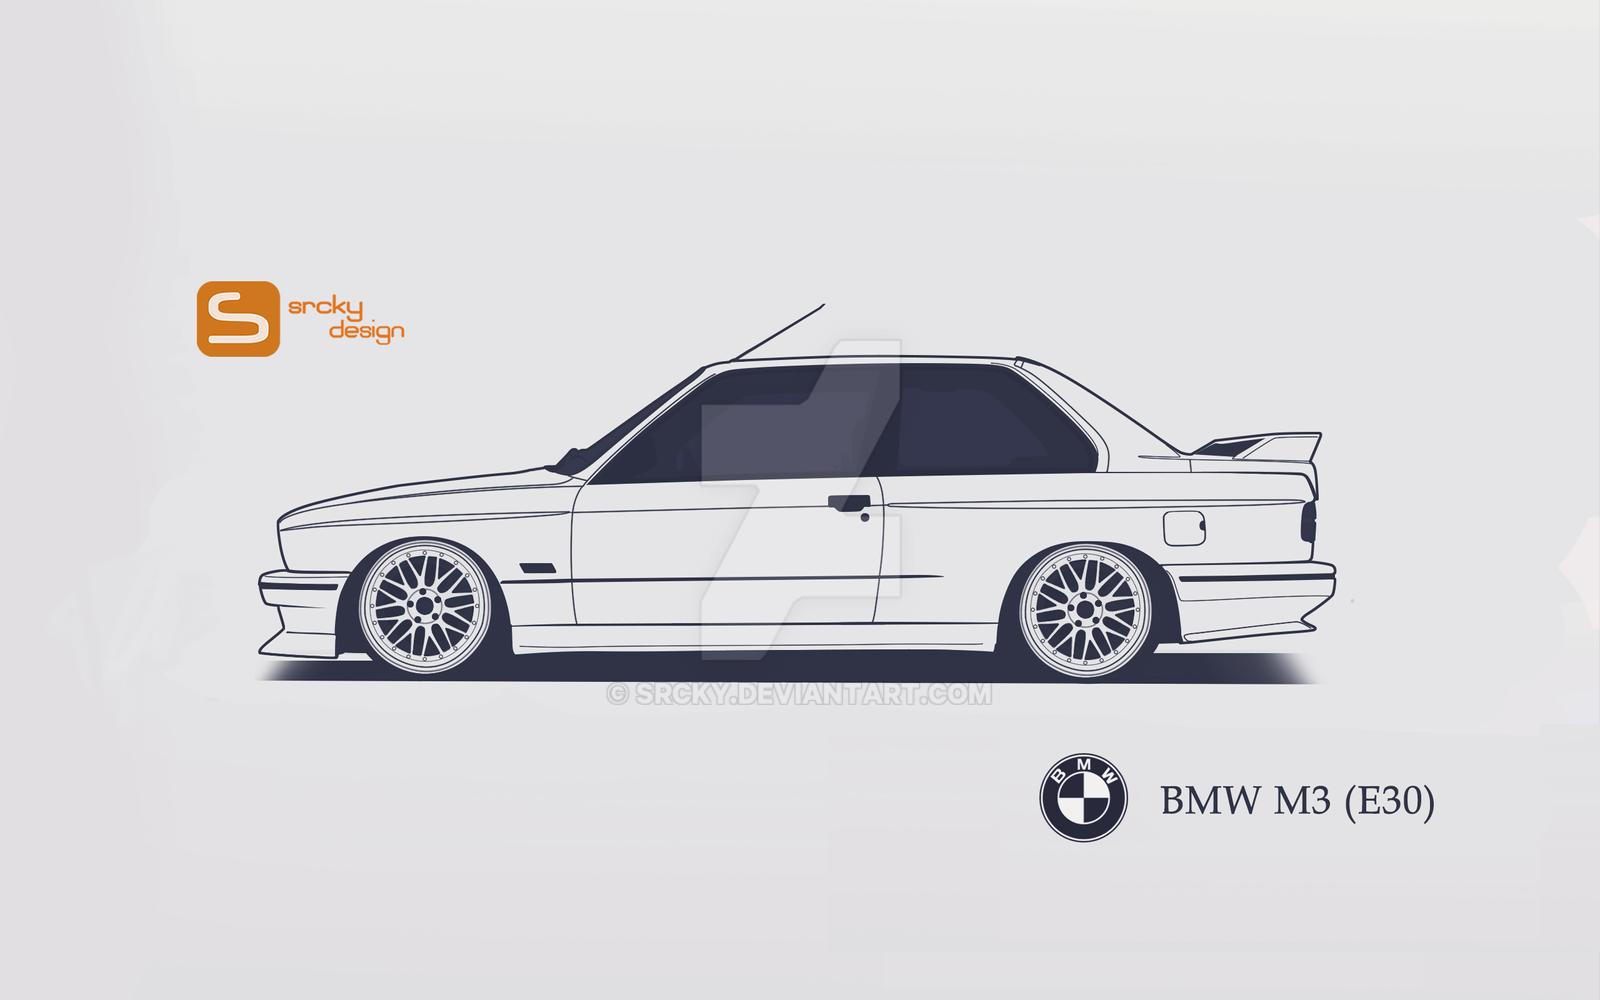 E30 Side View >> BMW M3 (E30) by SrCky on DeviantArt